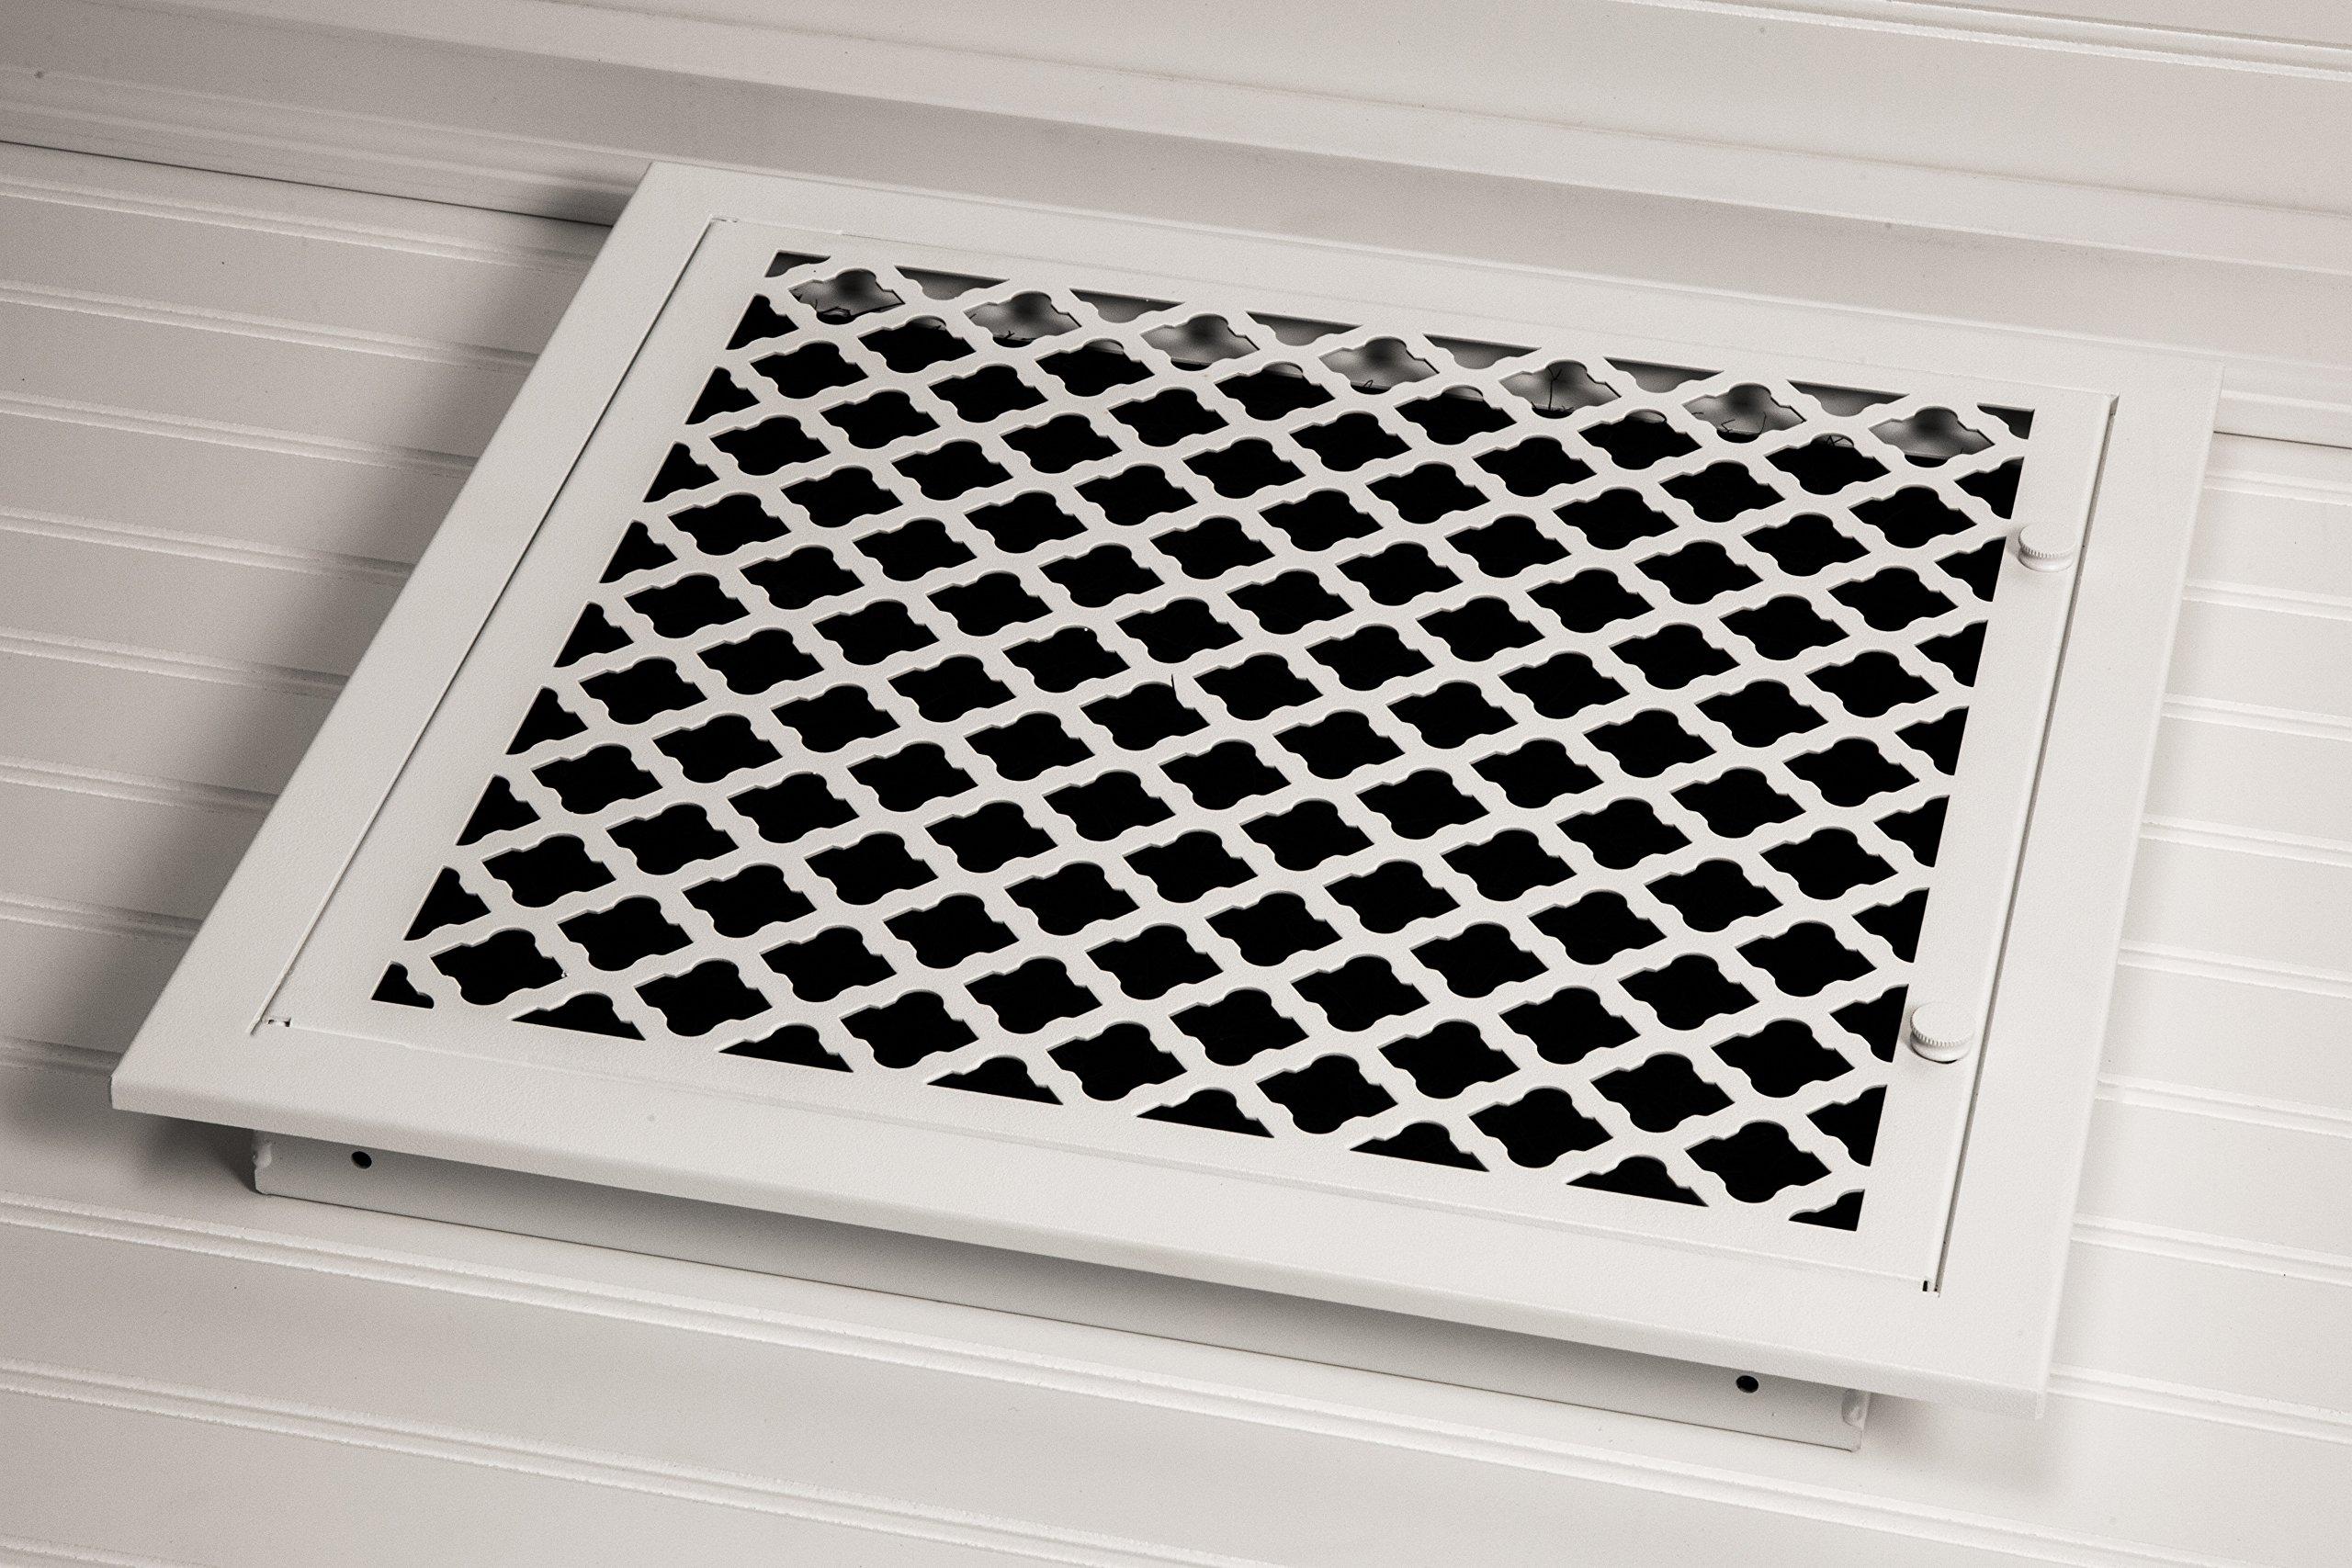 SteelCrest BTU14X14FFWH Bronze Series Designer Filter Return Vent with Hinged Door, White by SteelCrest